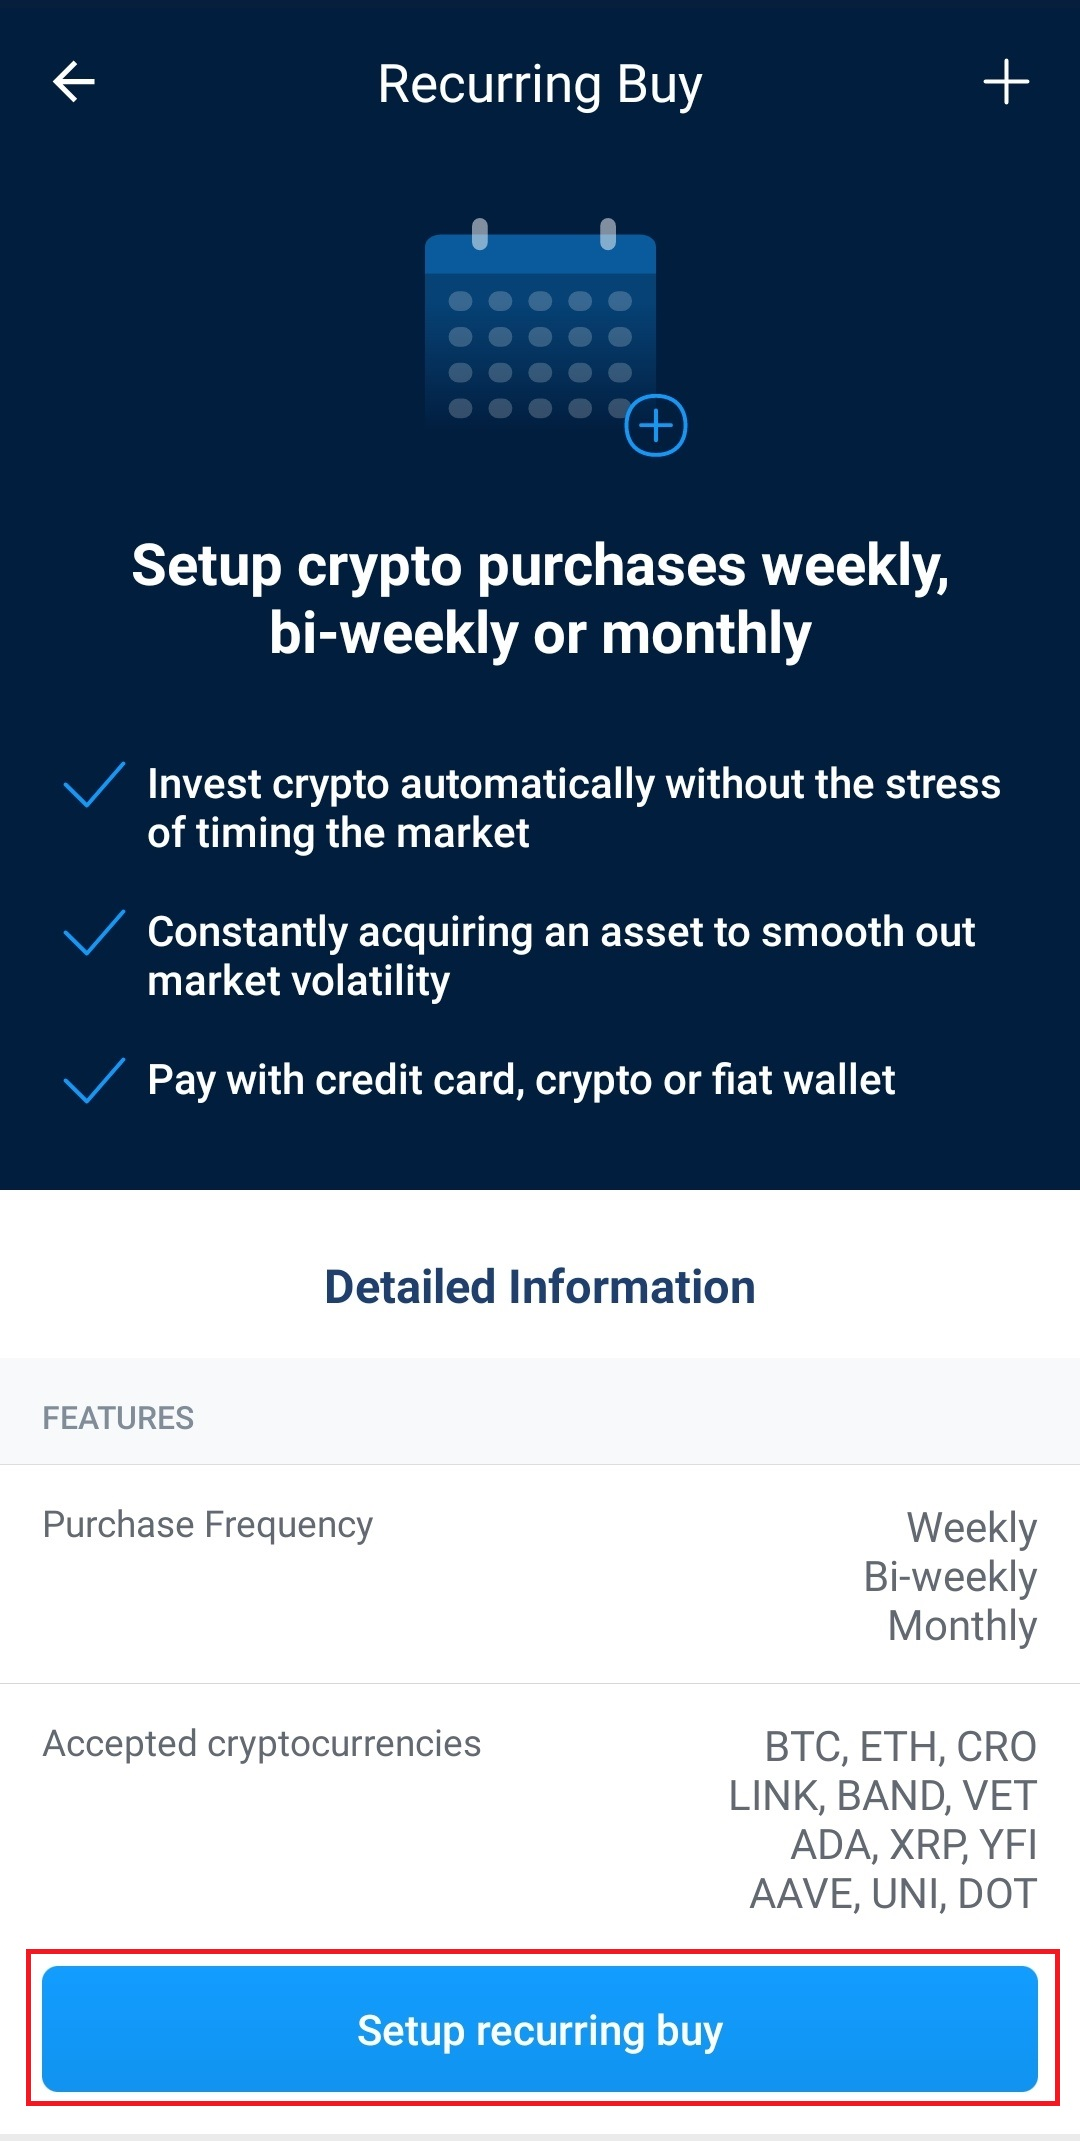 Recurring buy crypto.com